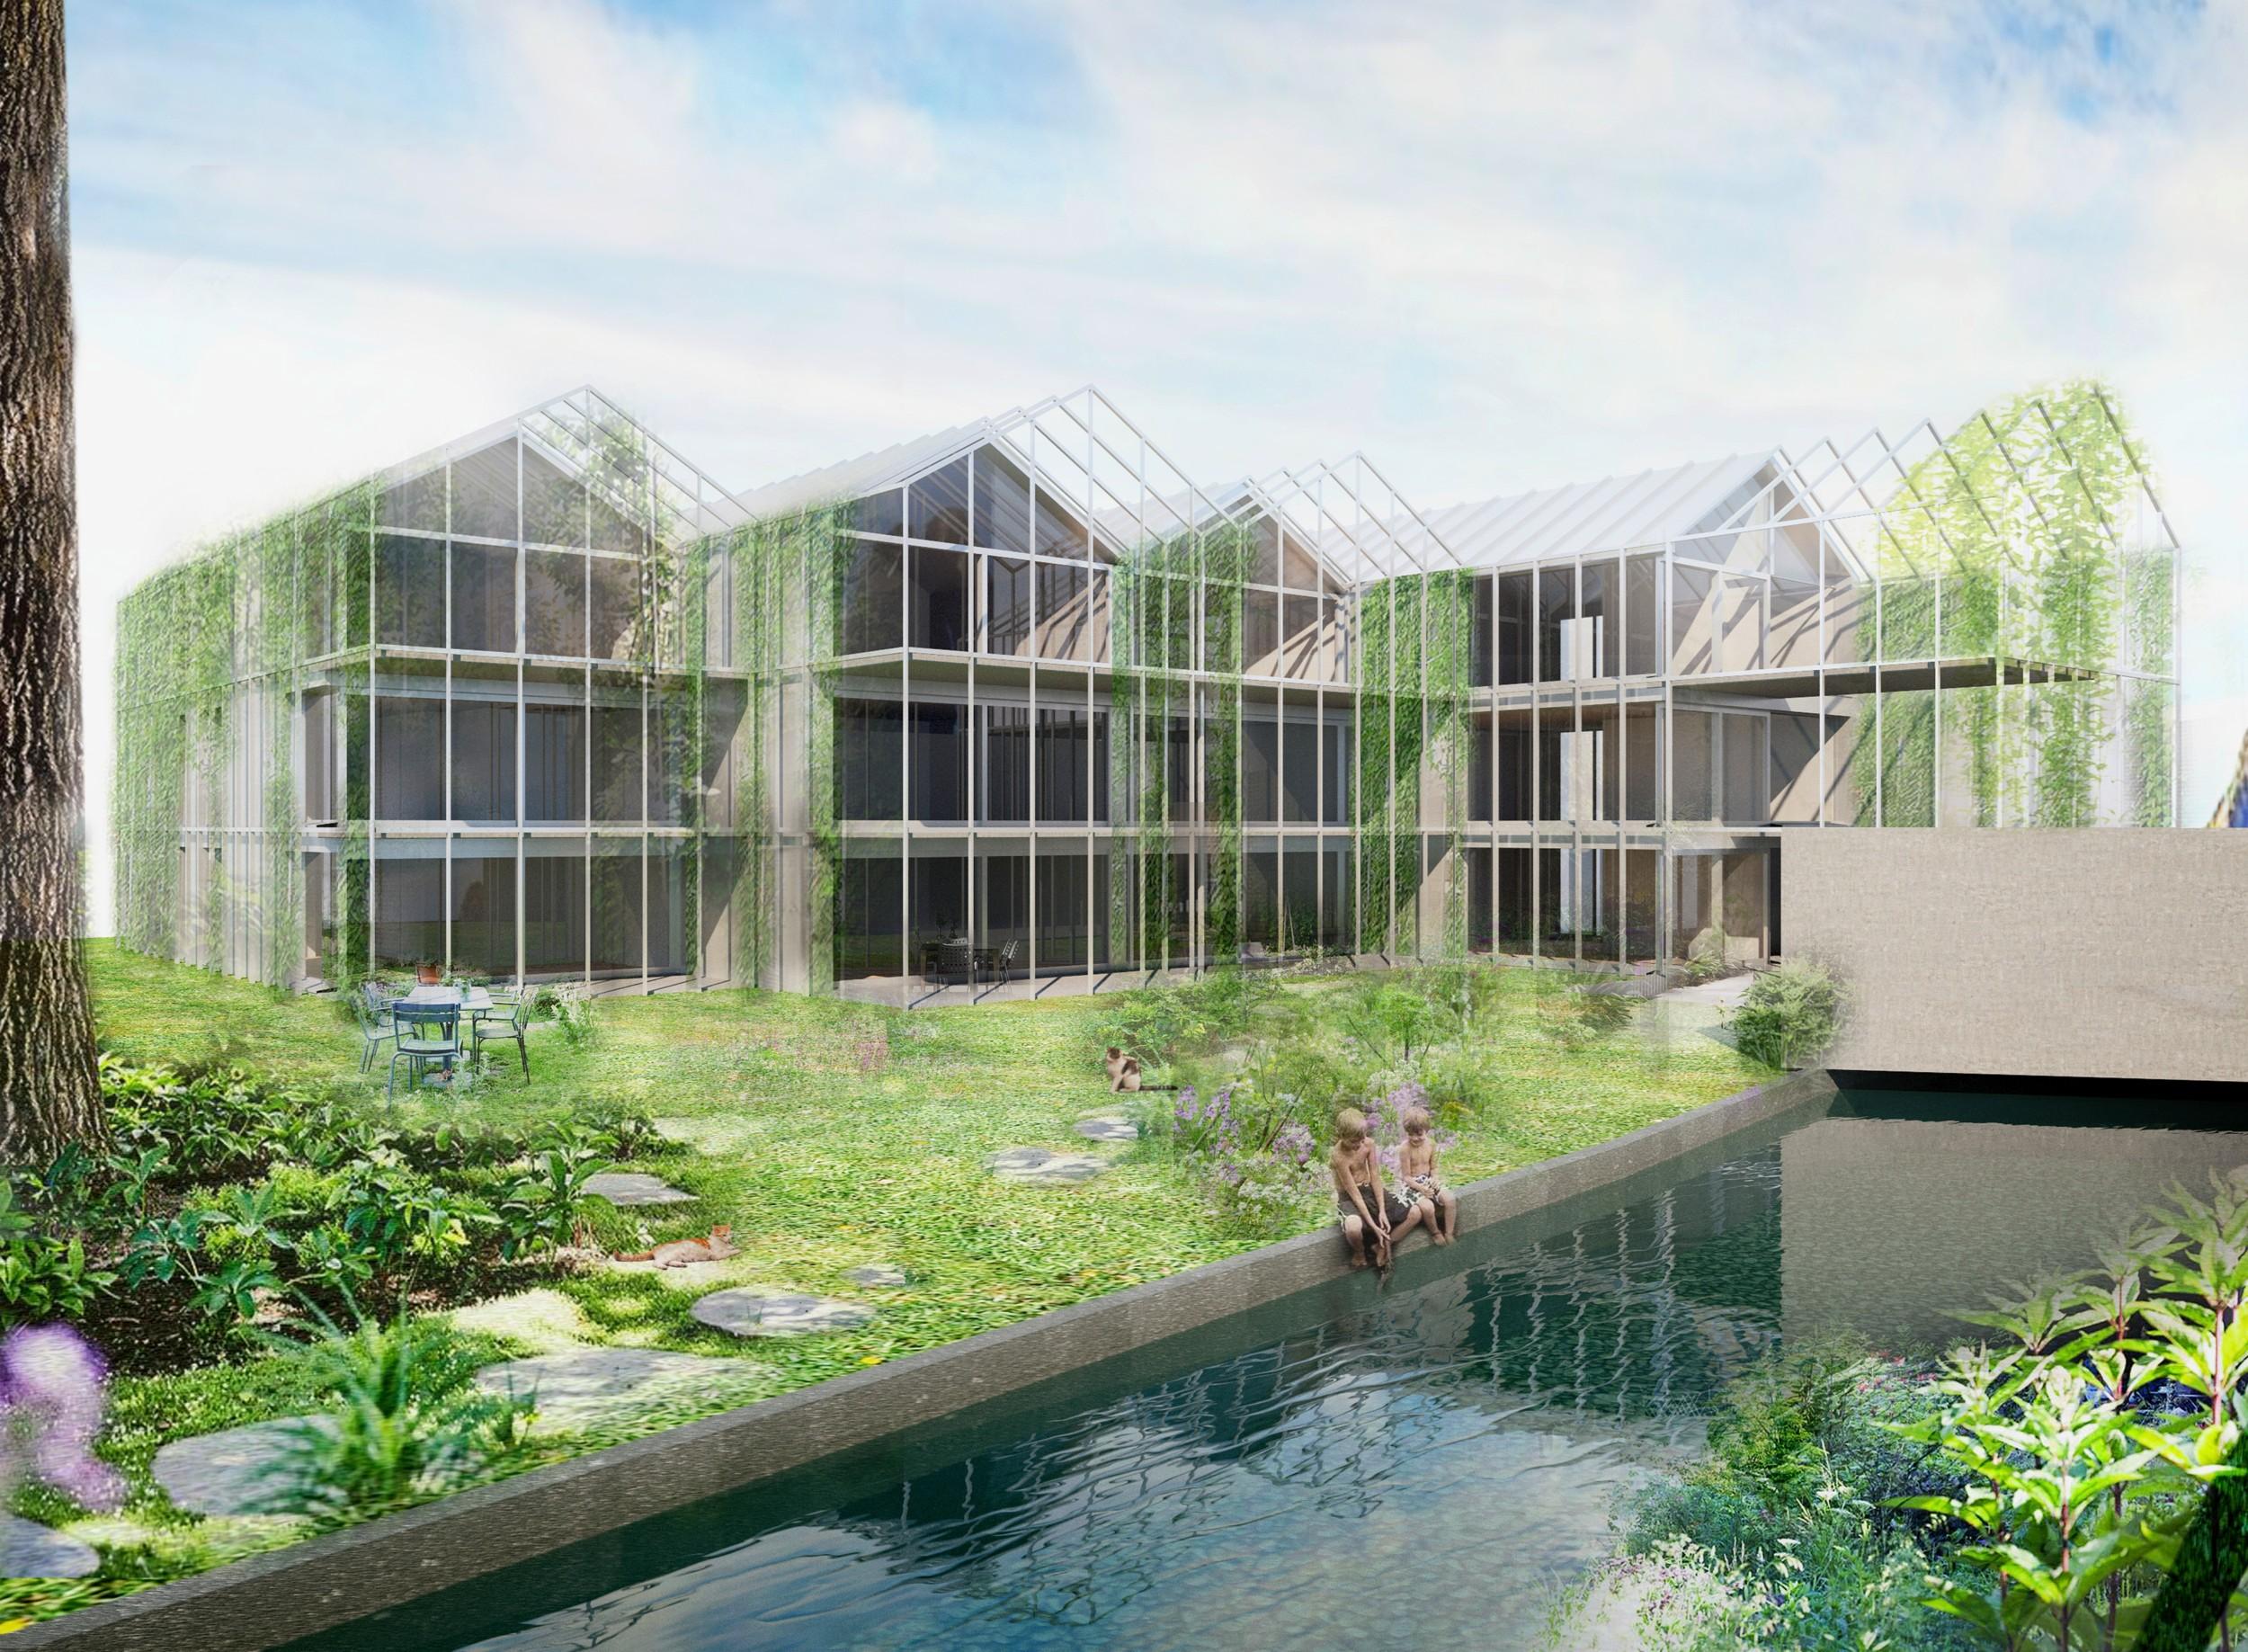 Eigentumswohnungen, Areal Eberle Floristik, Näfels